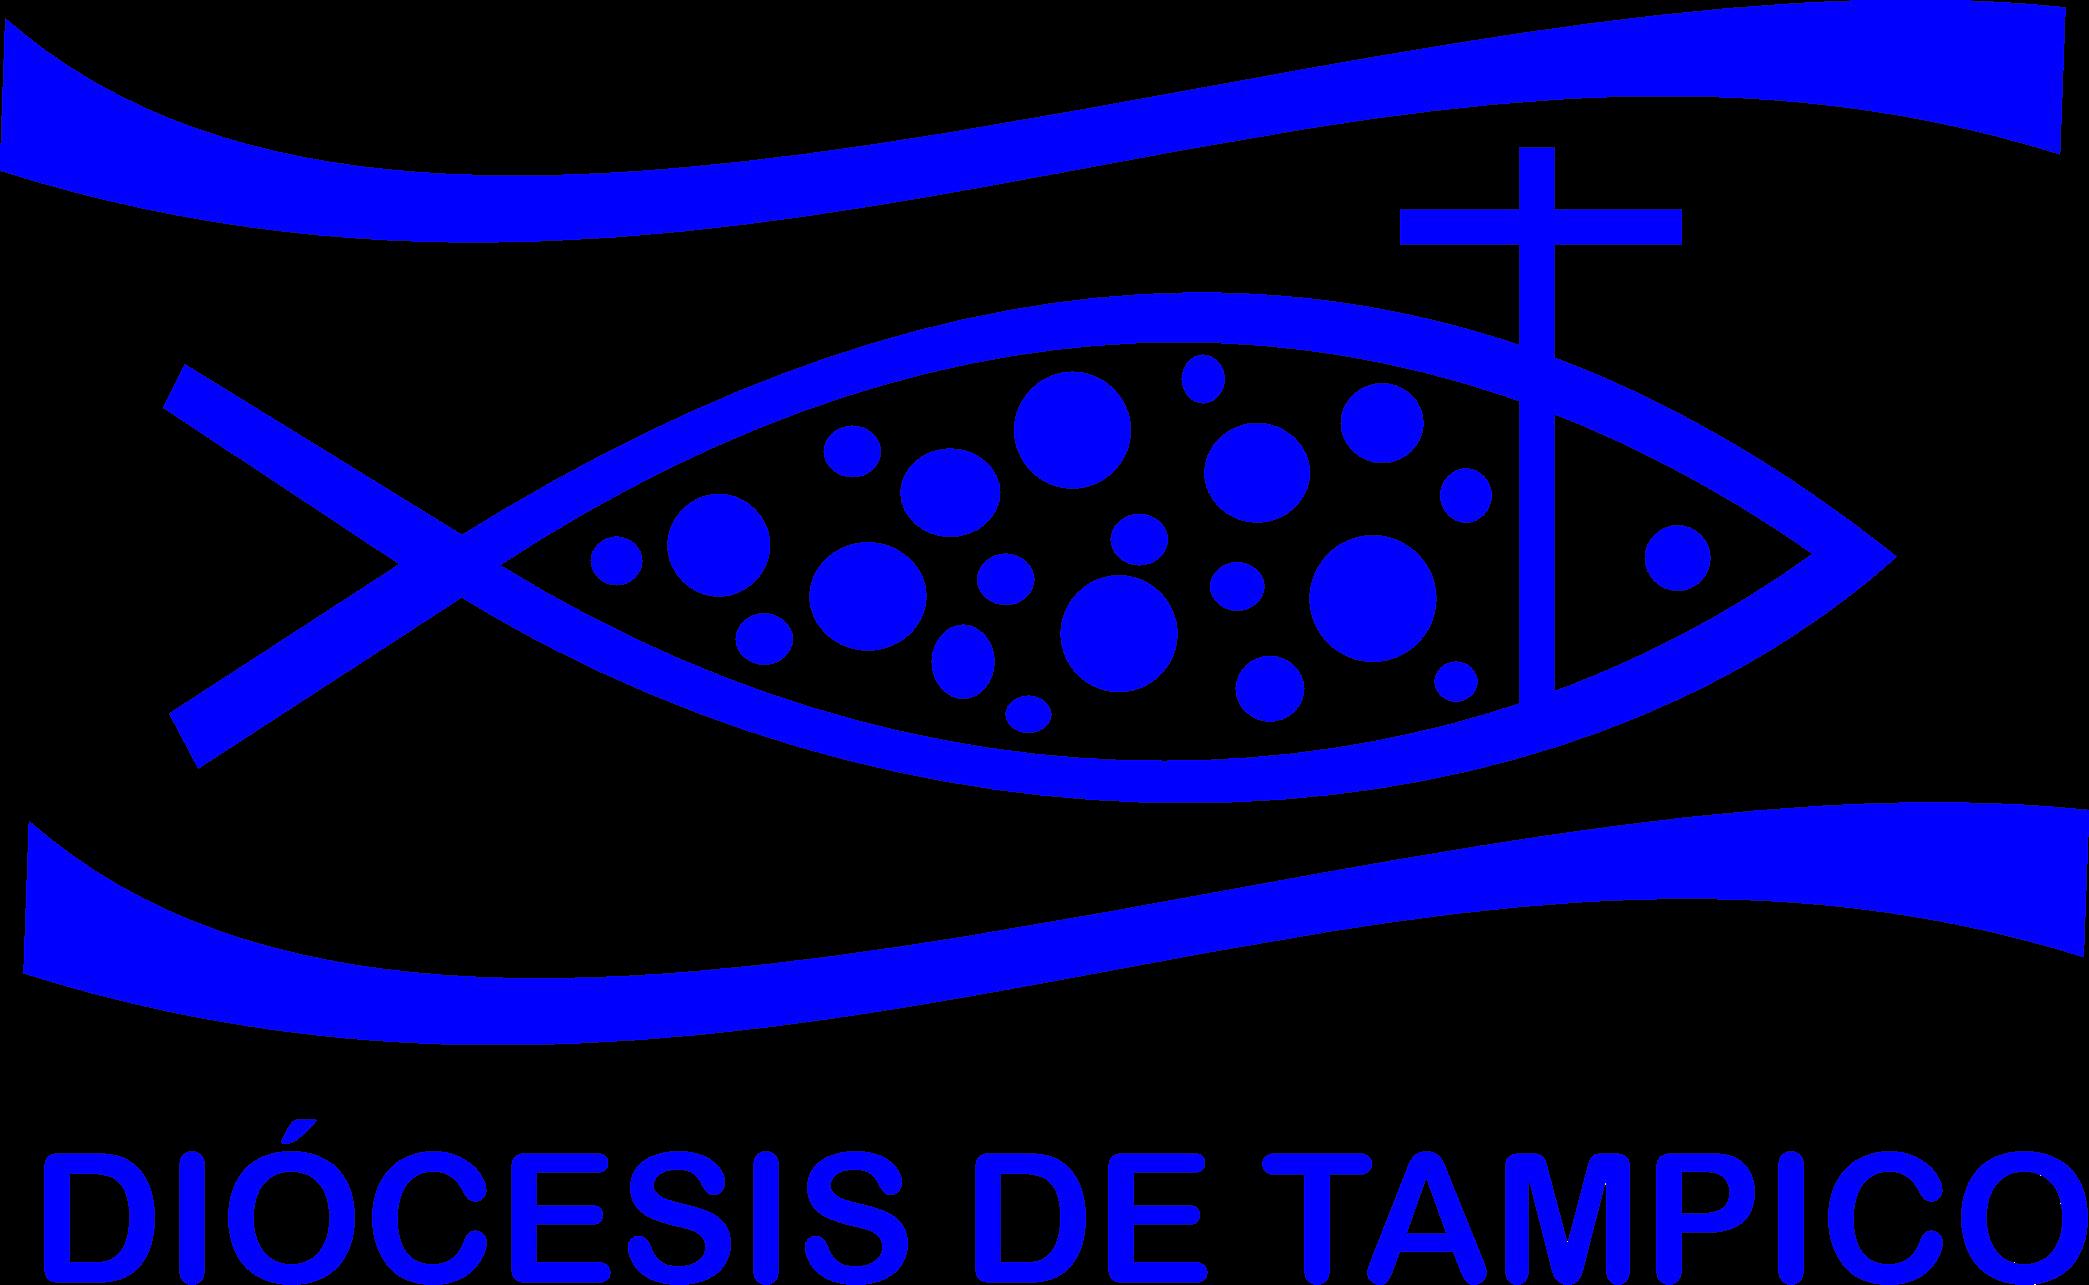 Diócesis de Tampico